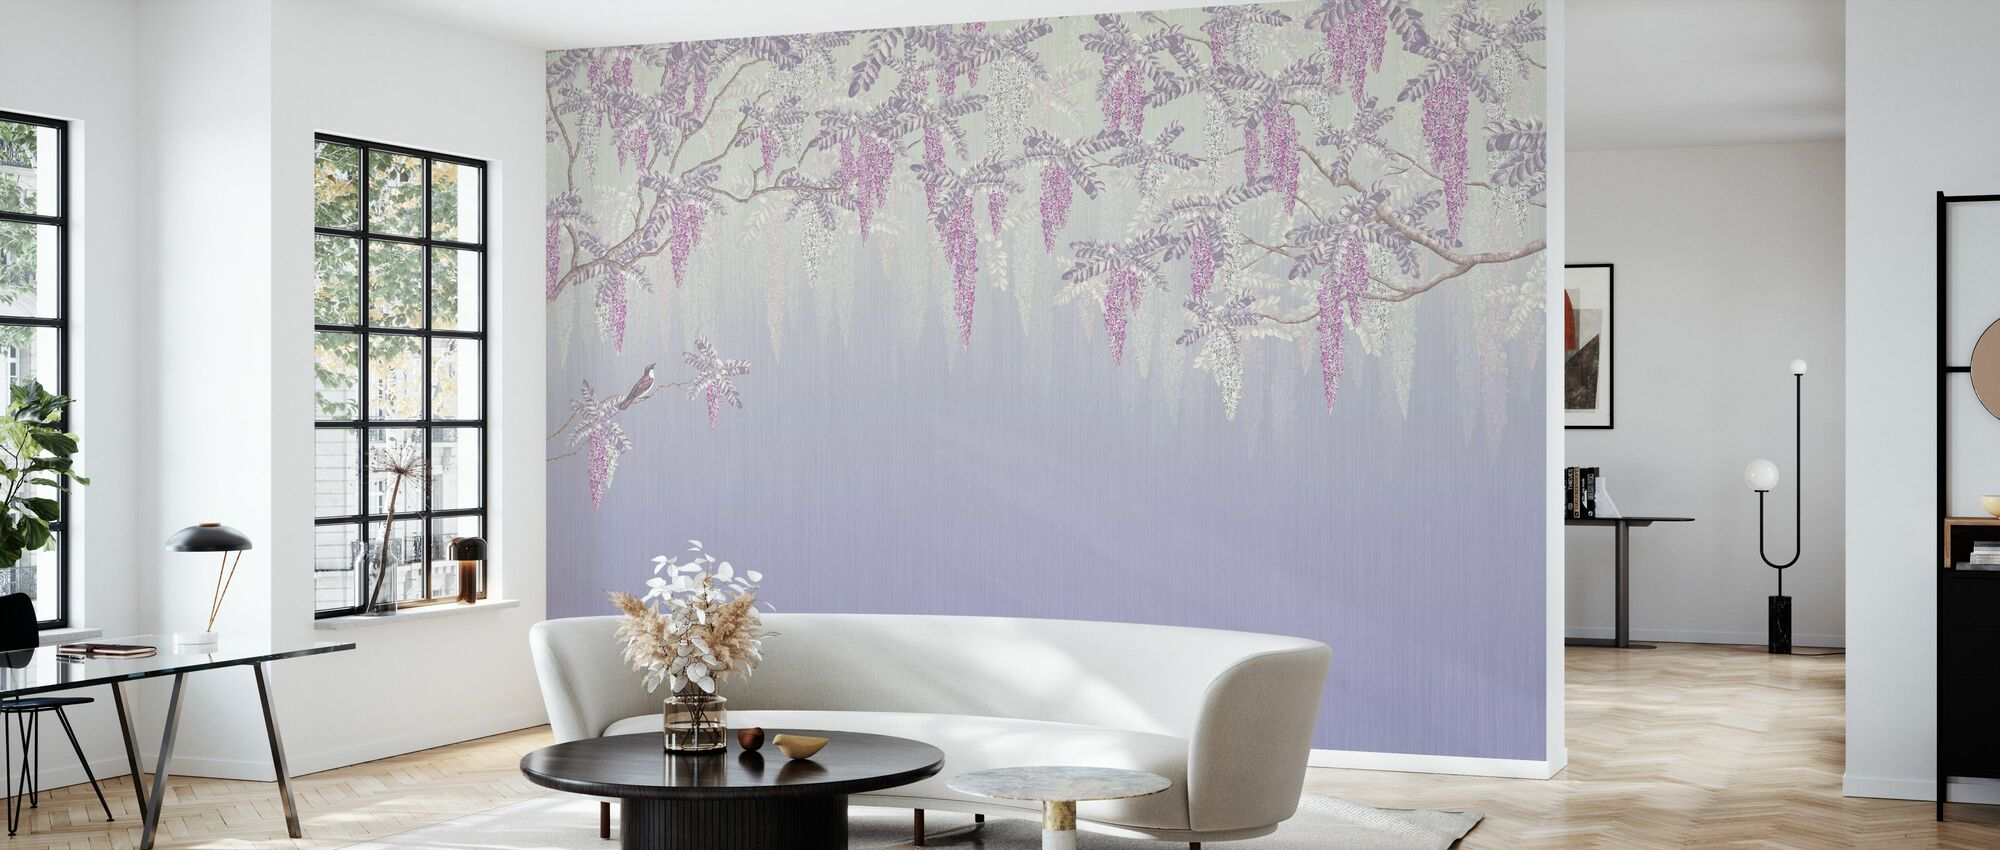 Wisteria - Violet - Wallpaper - Living Room